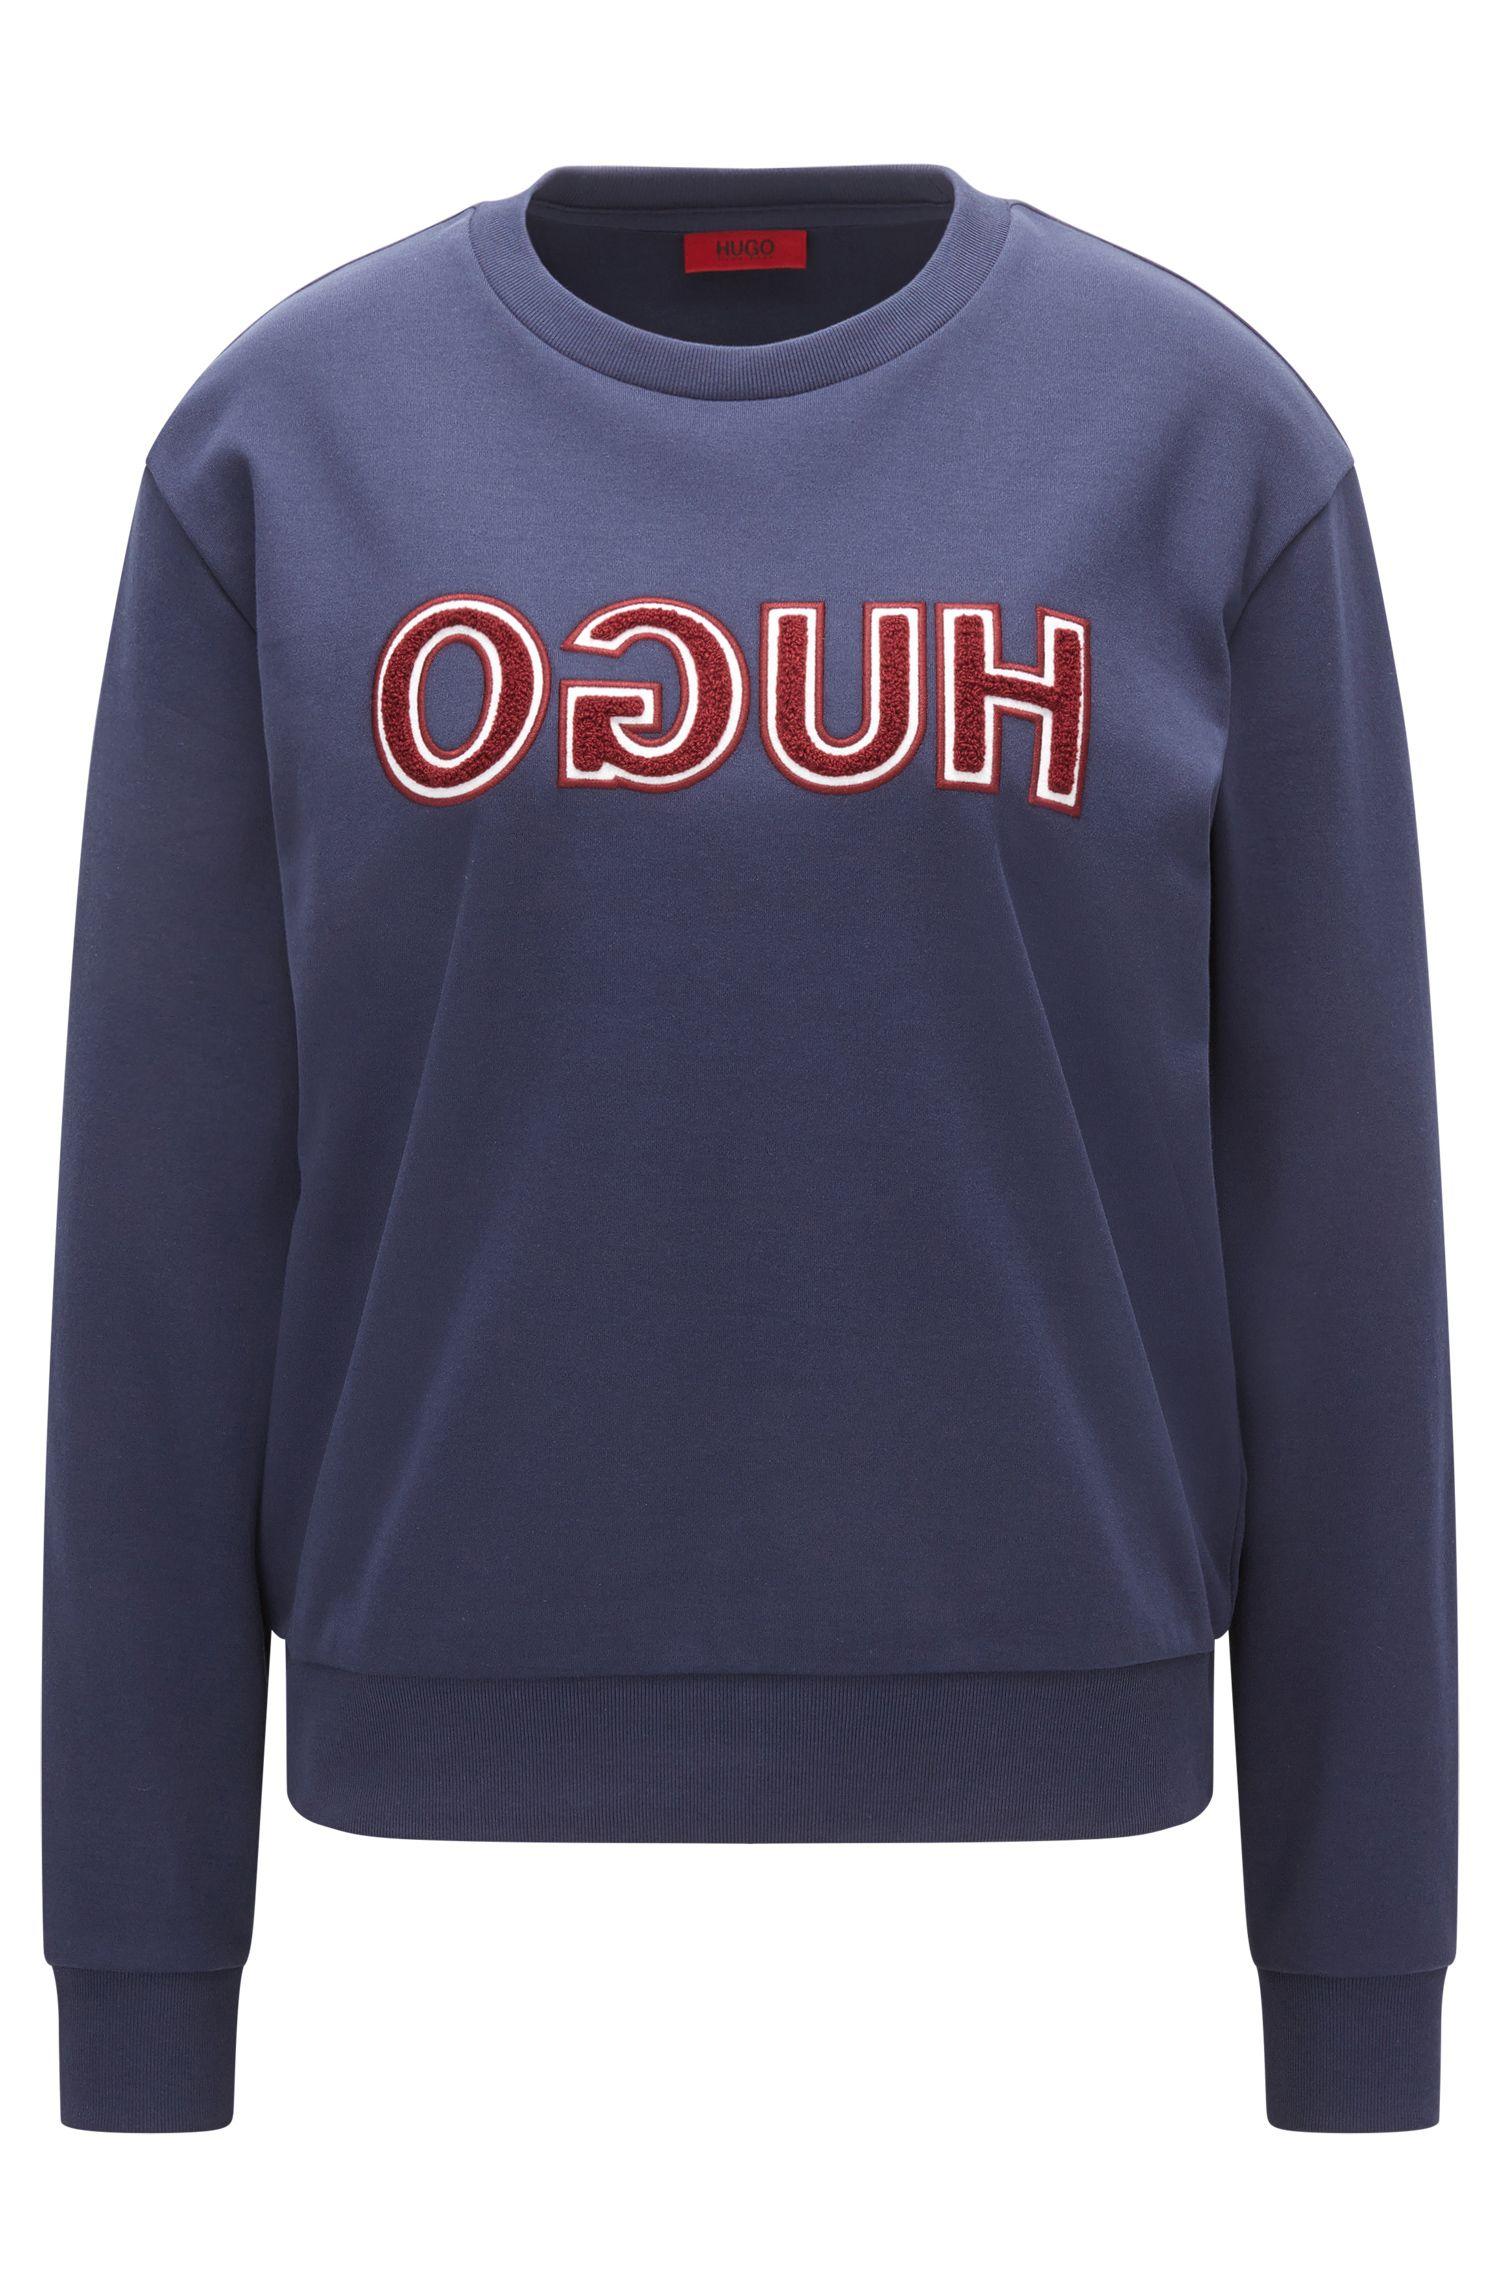 Cotton Logo Sweatershirt   Niccita